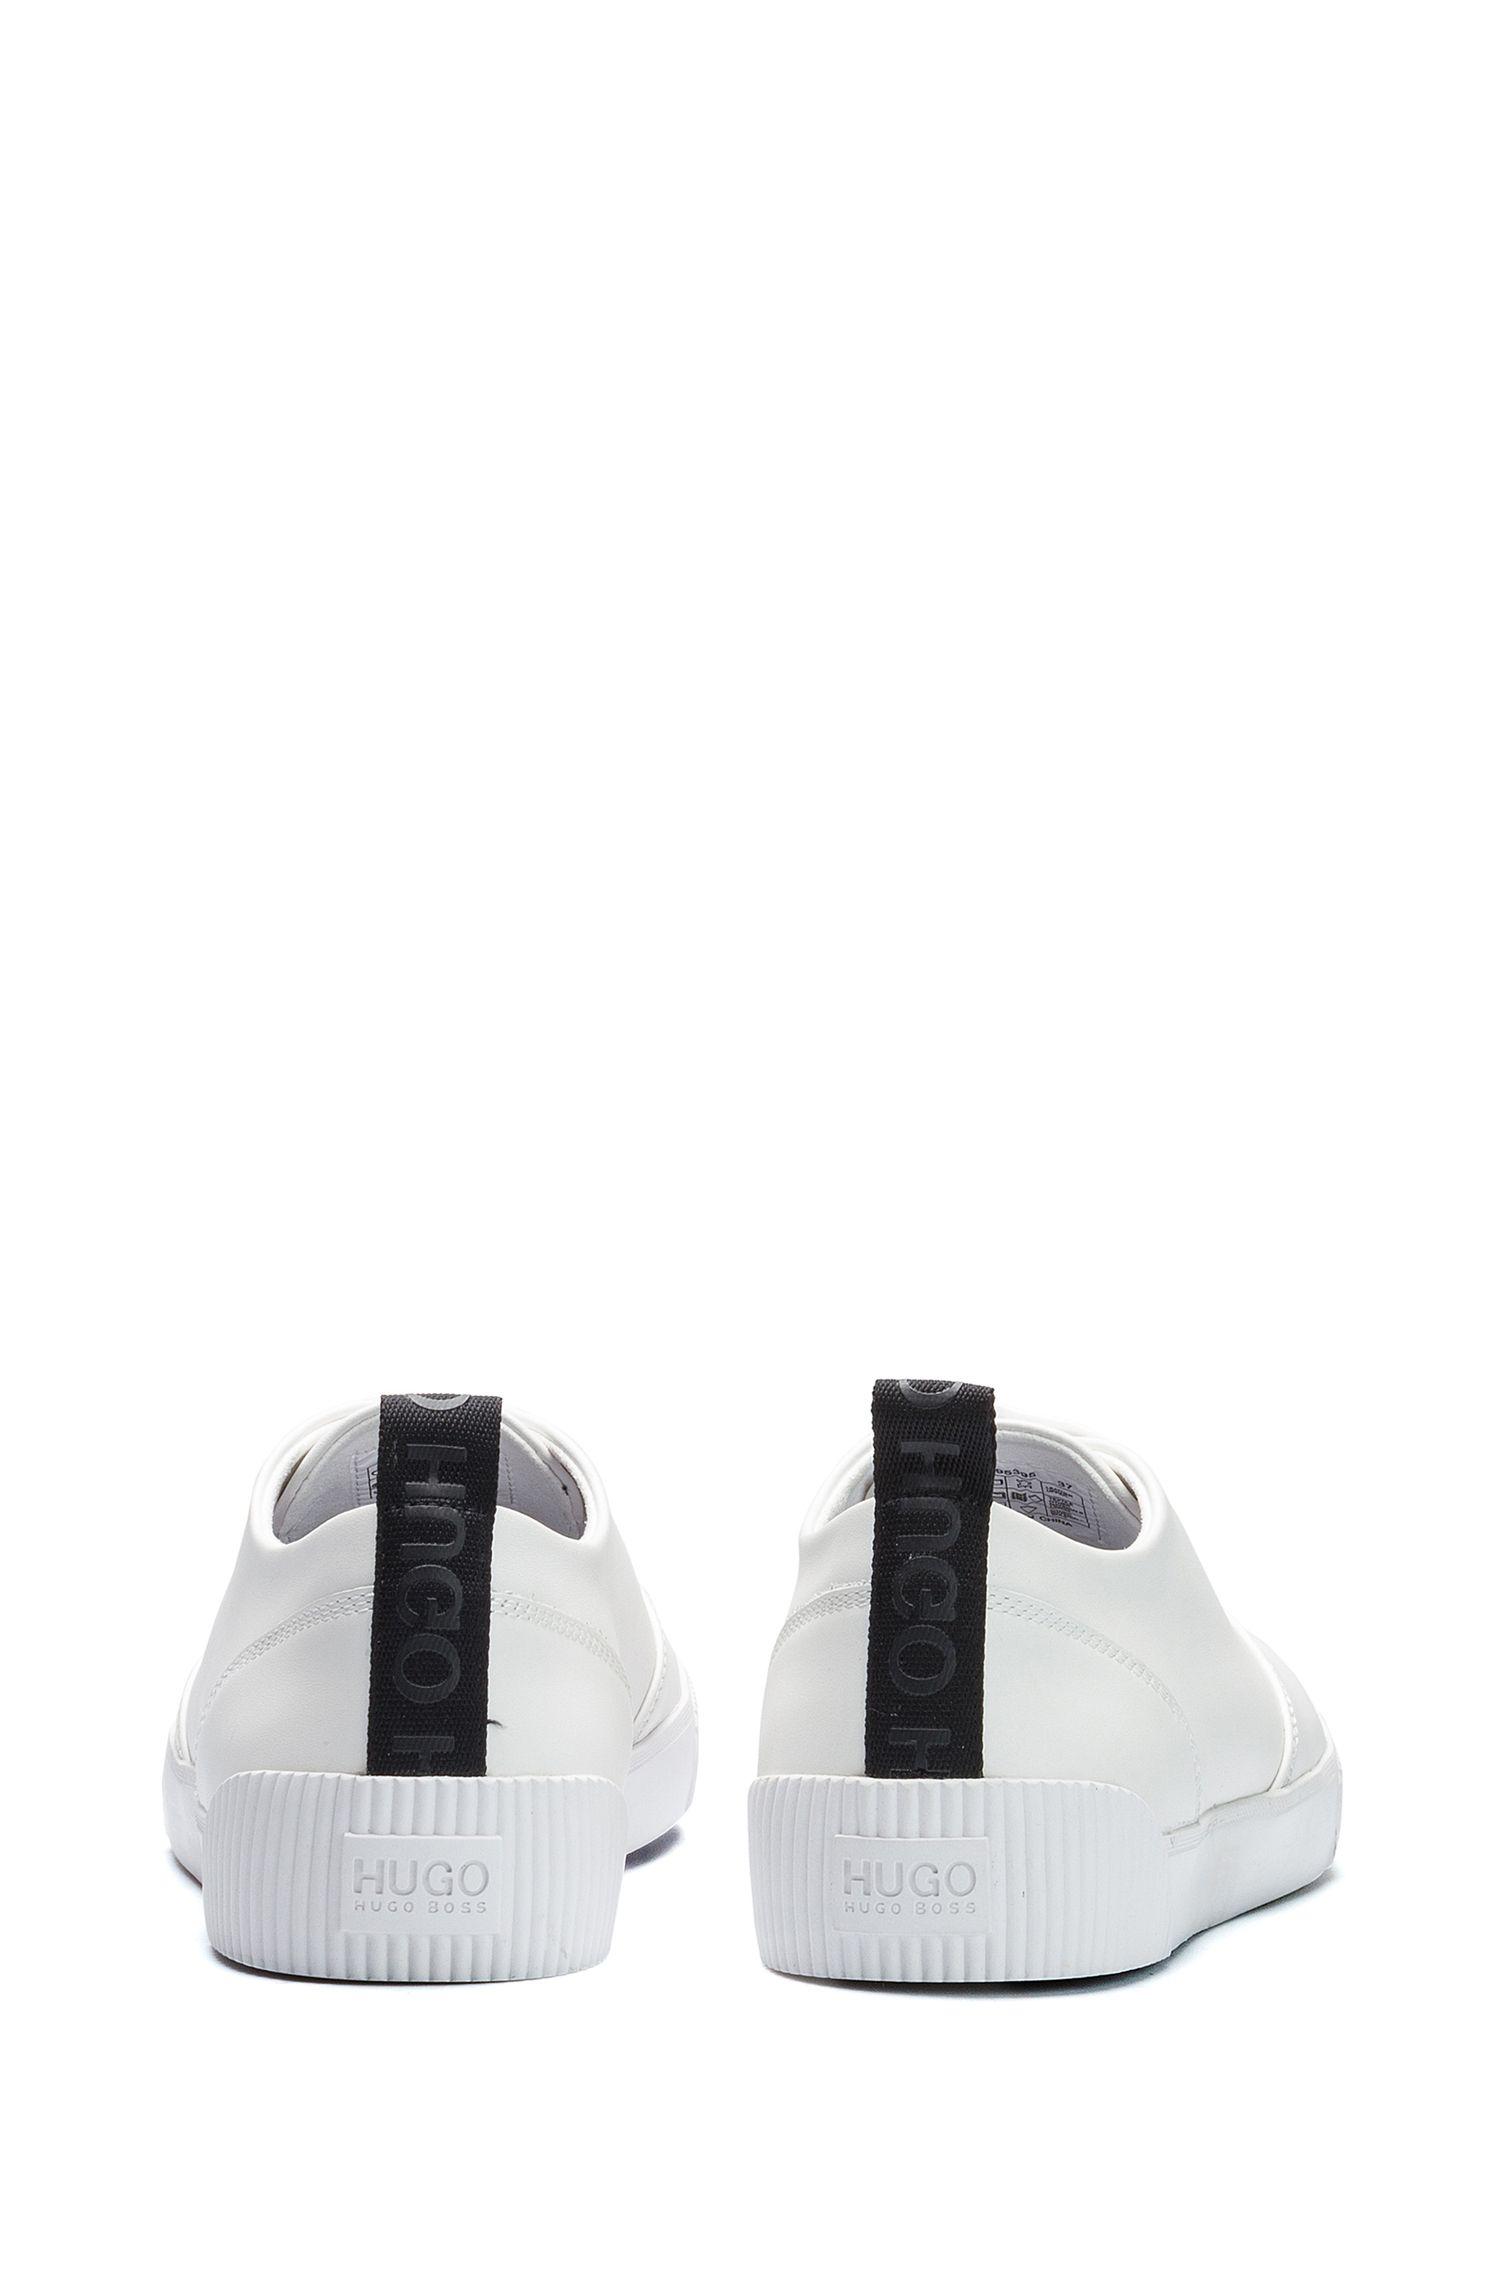 Sneakers in pelle con impunture